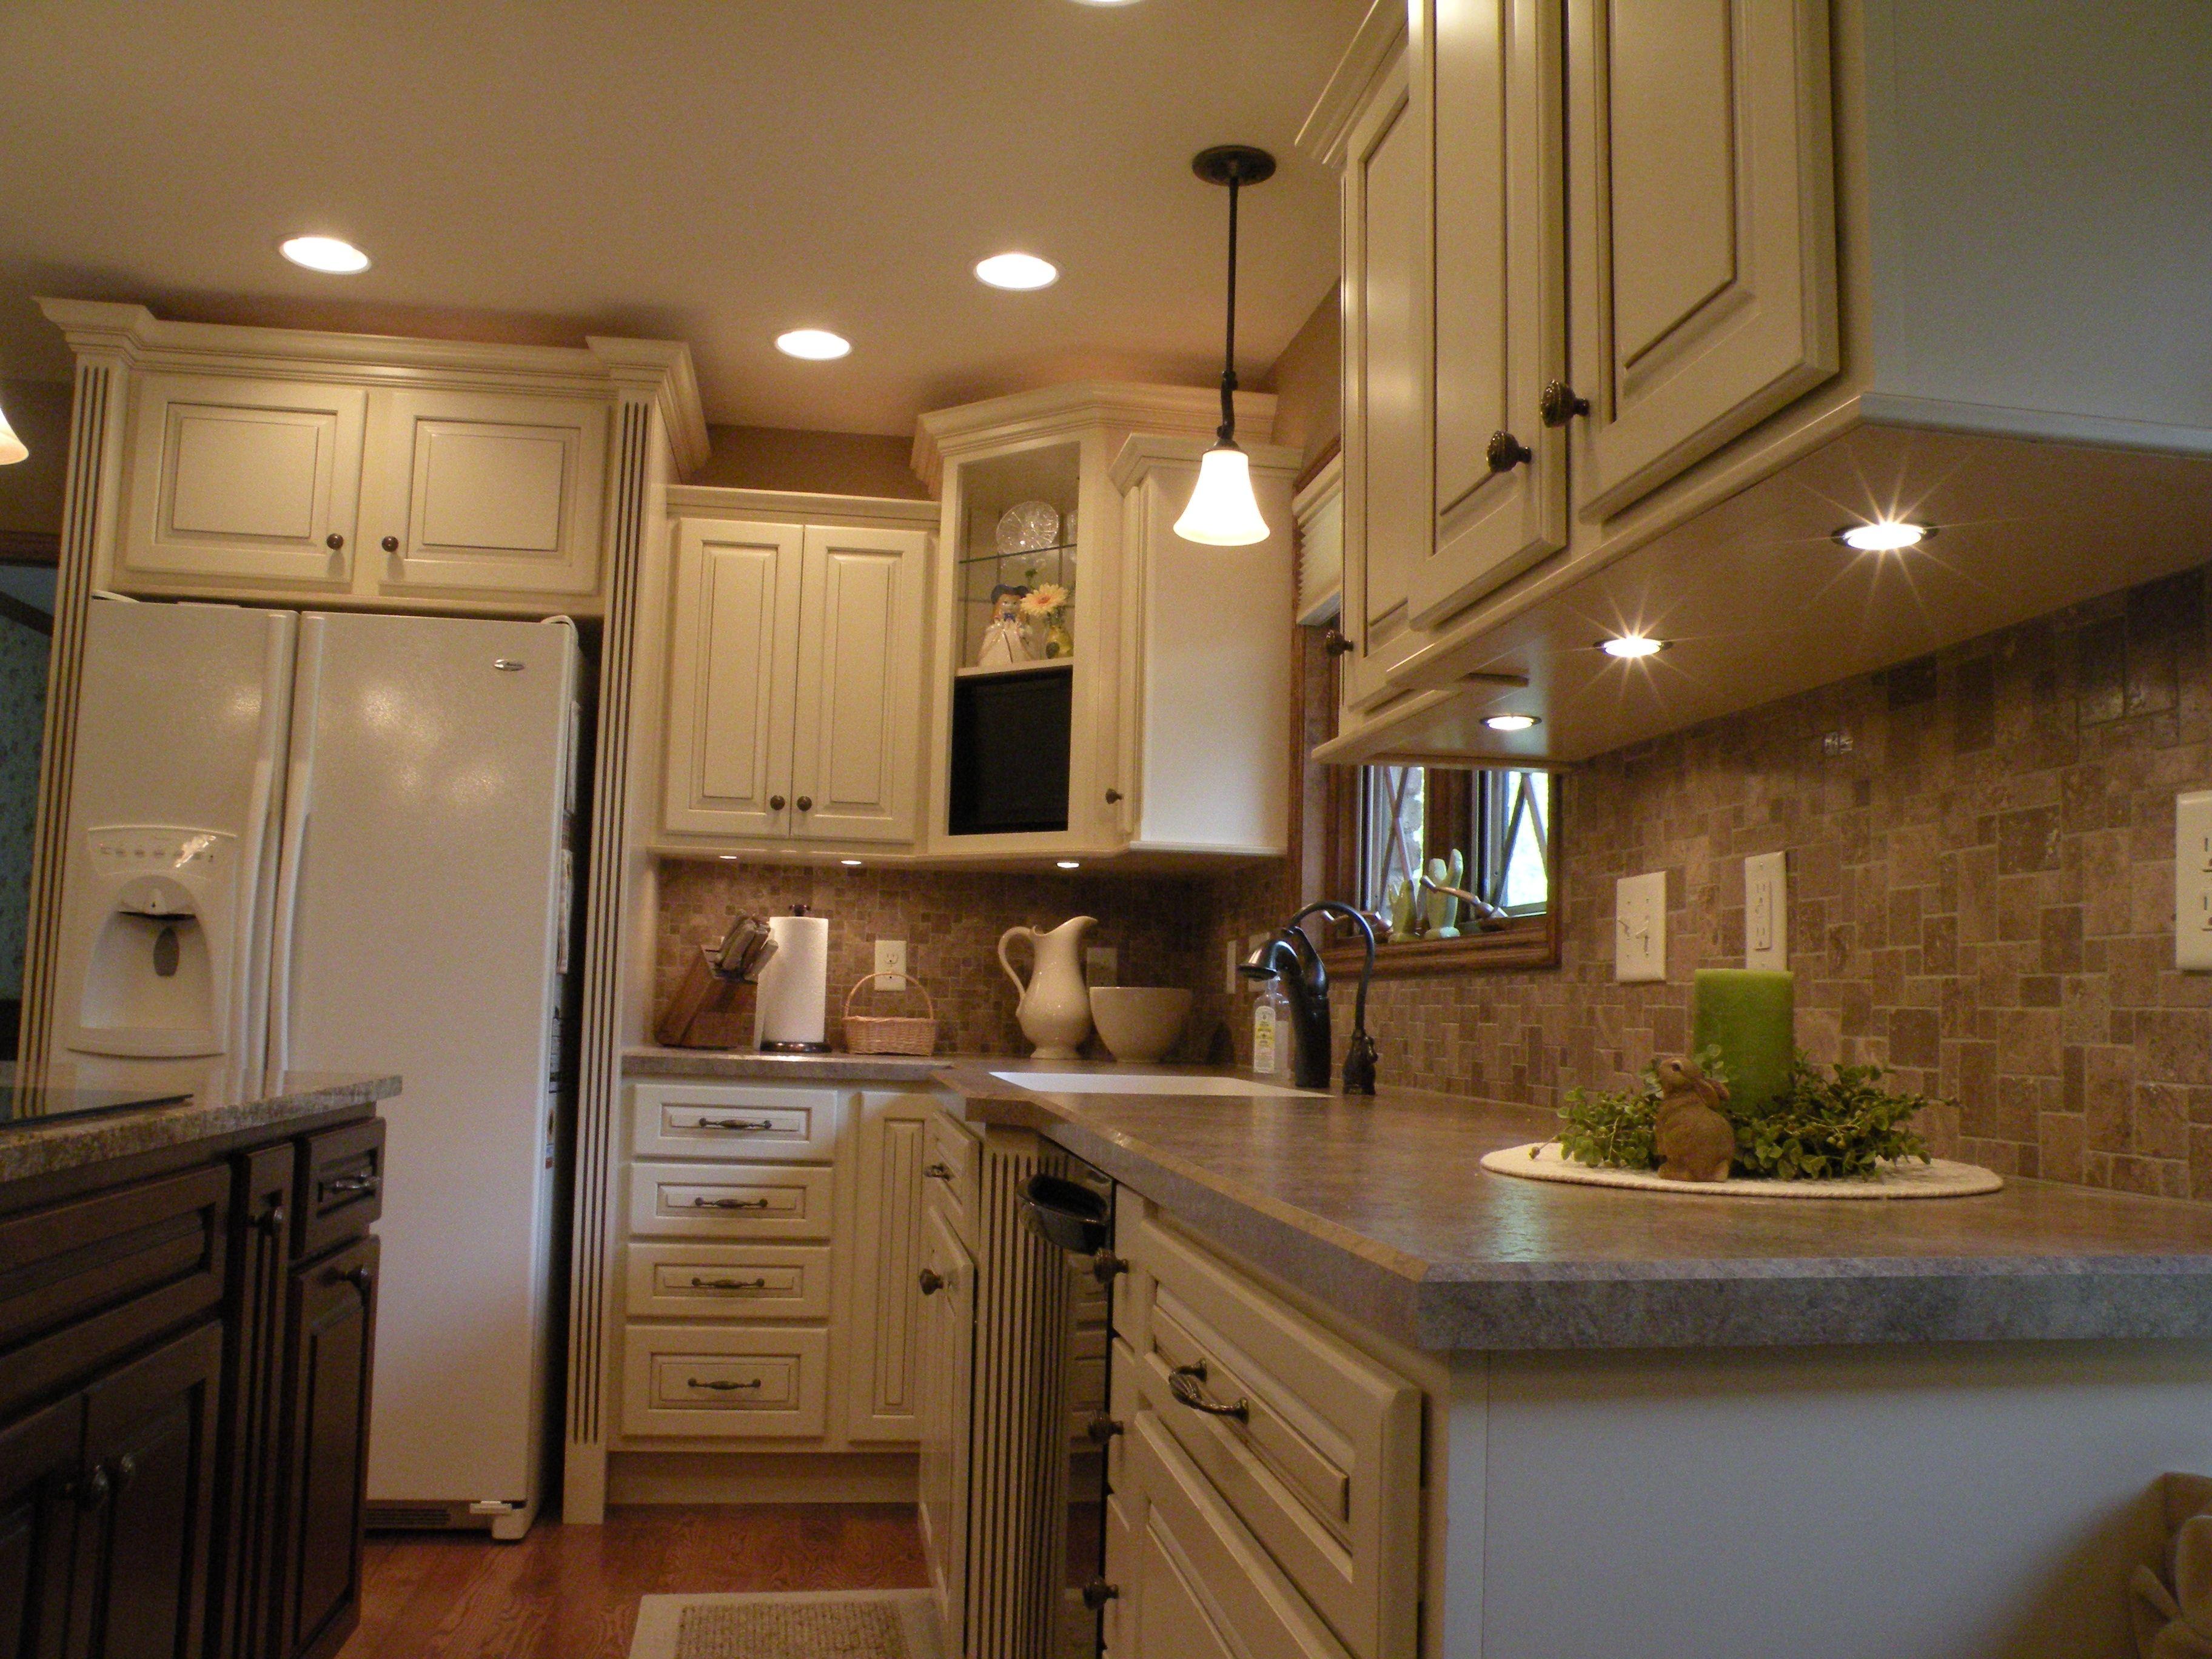 Kraftmaid Kitchen Cabinets Sizes Http Garecscleaningsystems Net Rh Pinterest Co Uk